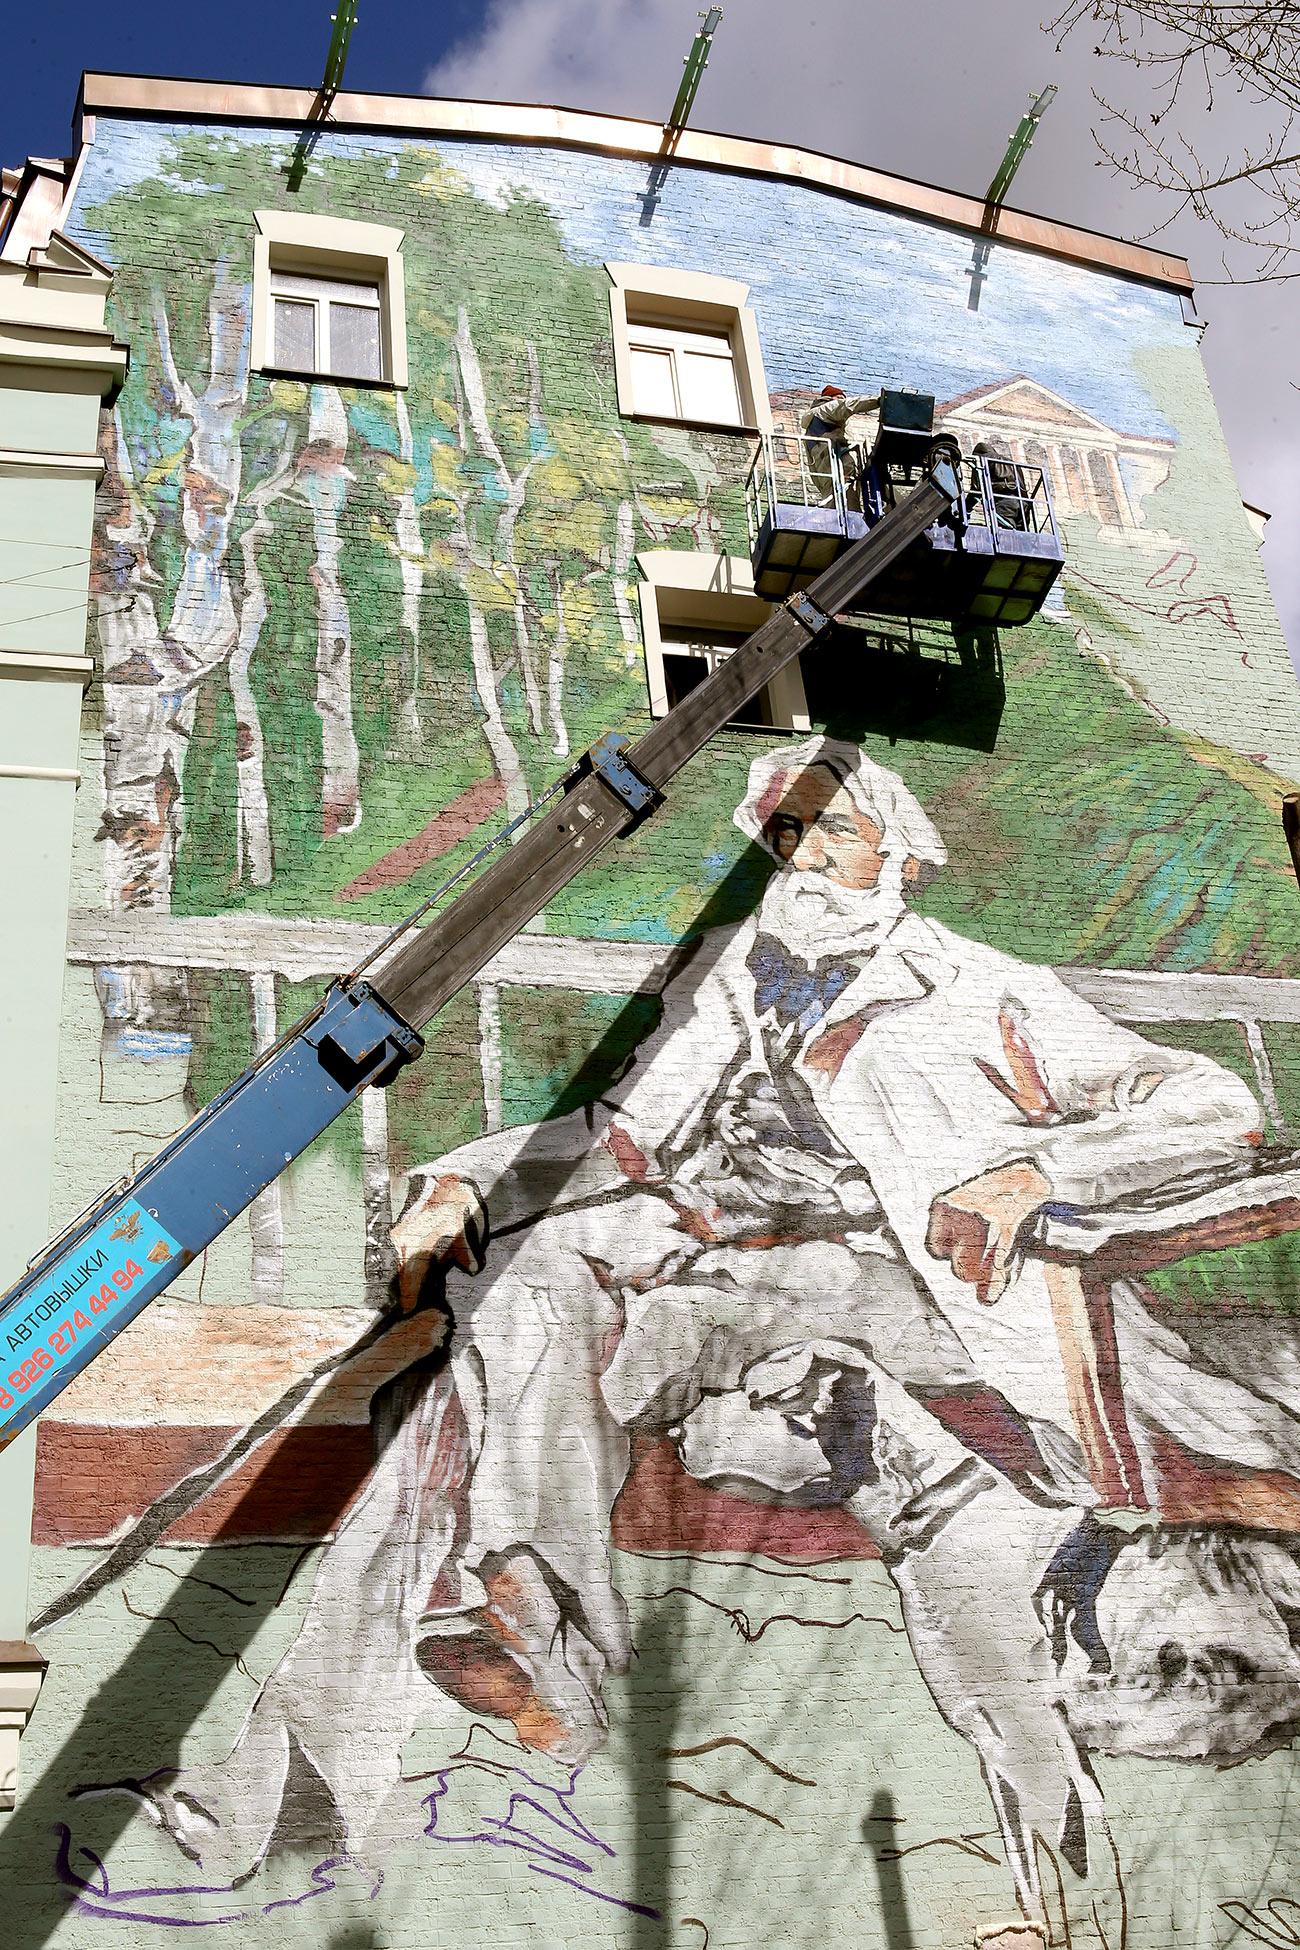 Graffiti-portrait of Ivan Turgenev on the wall of 37/7 Ostozhenka Street, Moscow. Source: Vitaliy Belousov/RIA Novosti